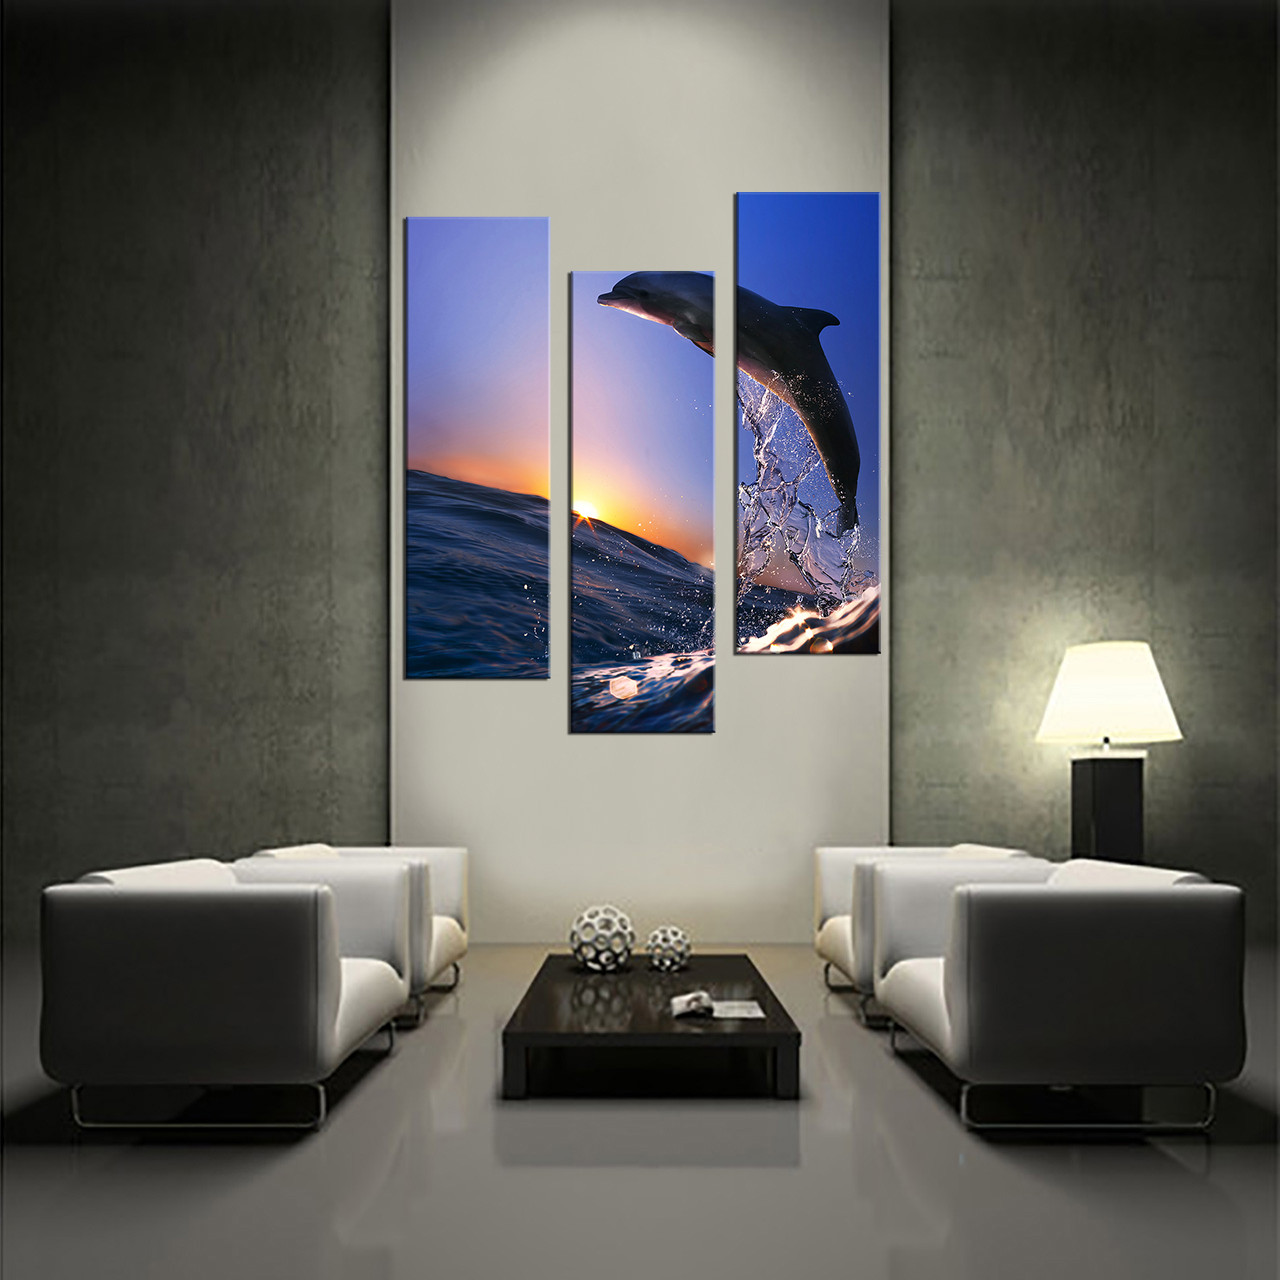 Living Room Wall Art, 3 Piece Huge Canvas Art, Horse Multi Panel Art,